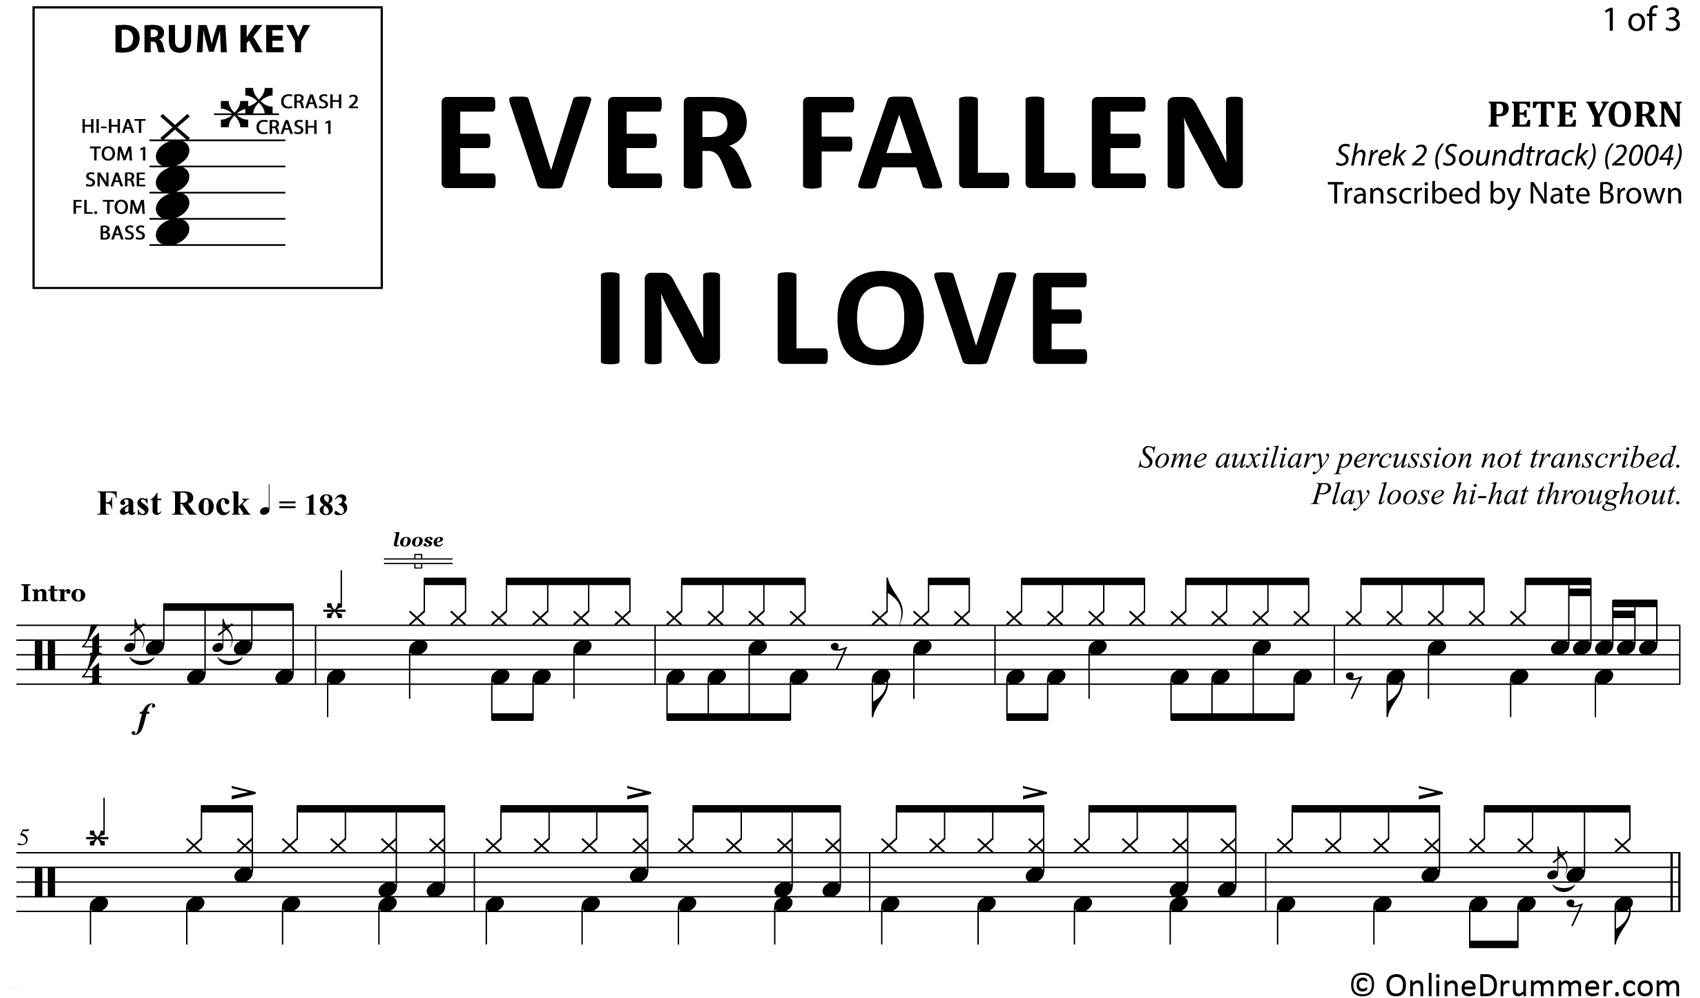 Ever Fallen In Love - Pete Yorn - Drum Sheet Music